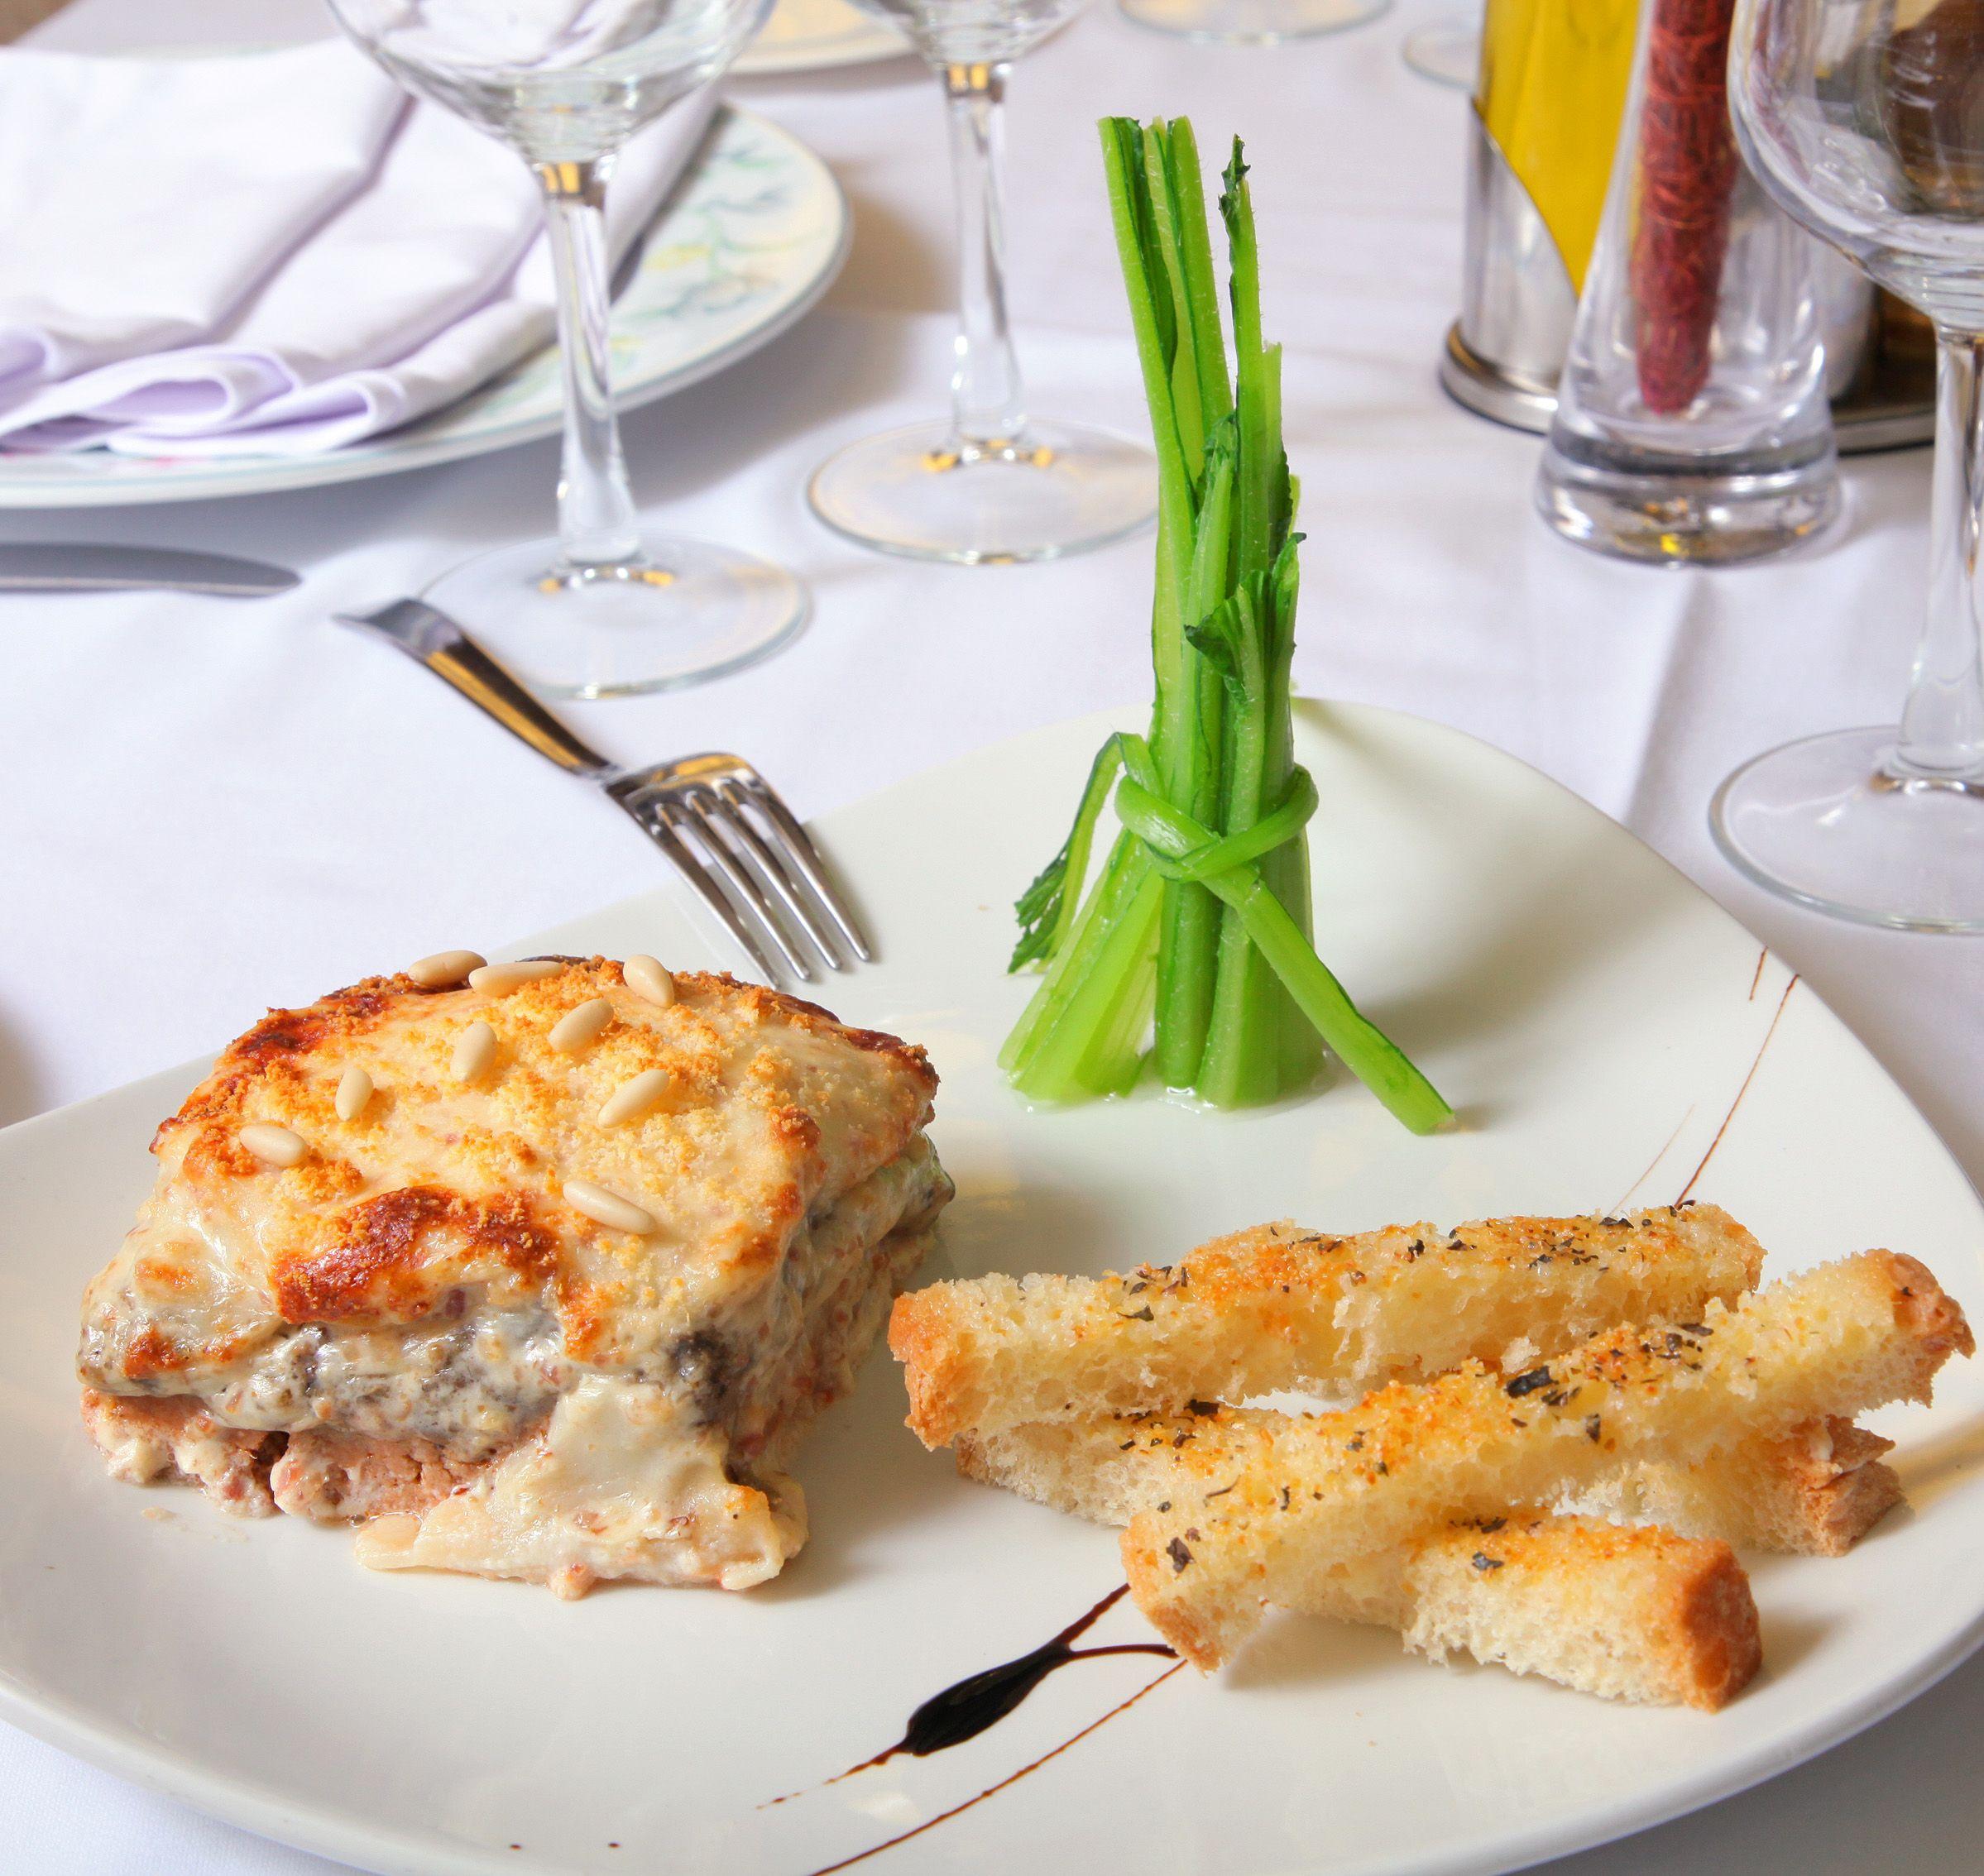 Restaurante Velagua:  Lasaña de ternasco, borrajitas de Aragón y pan de ajo